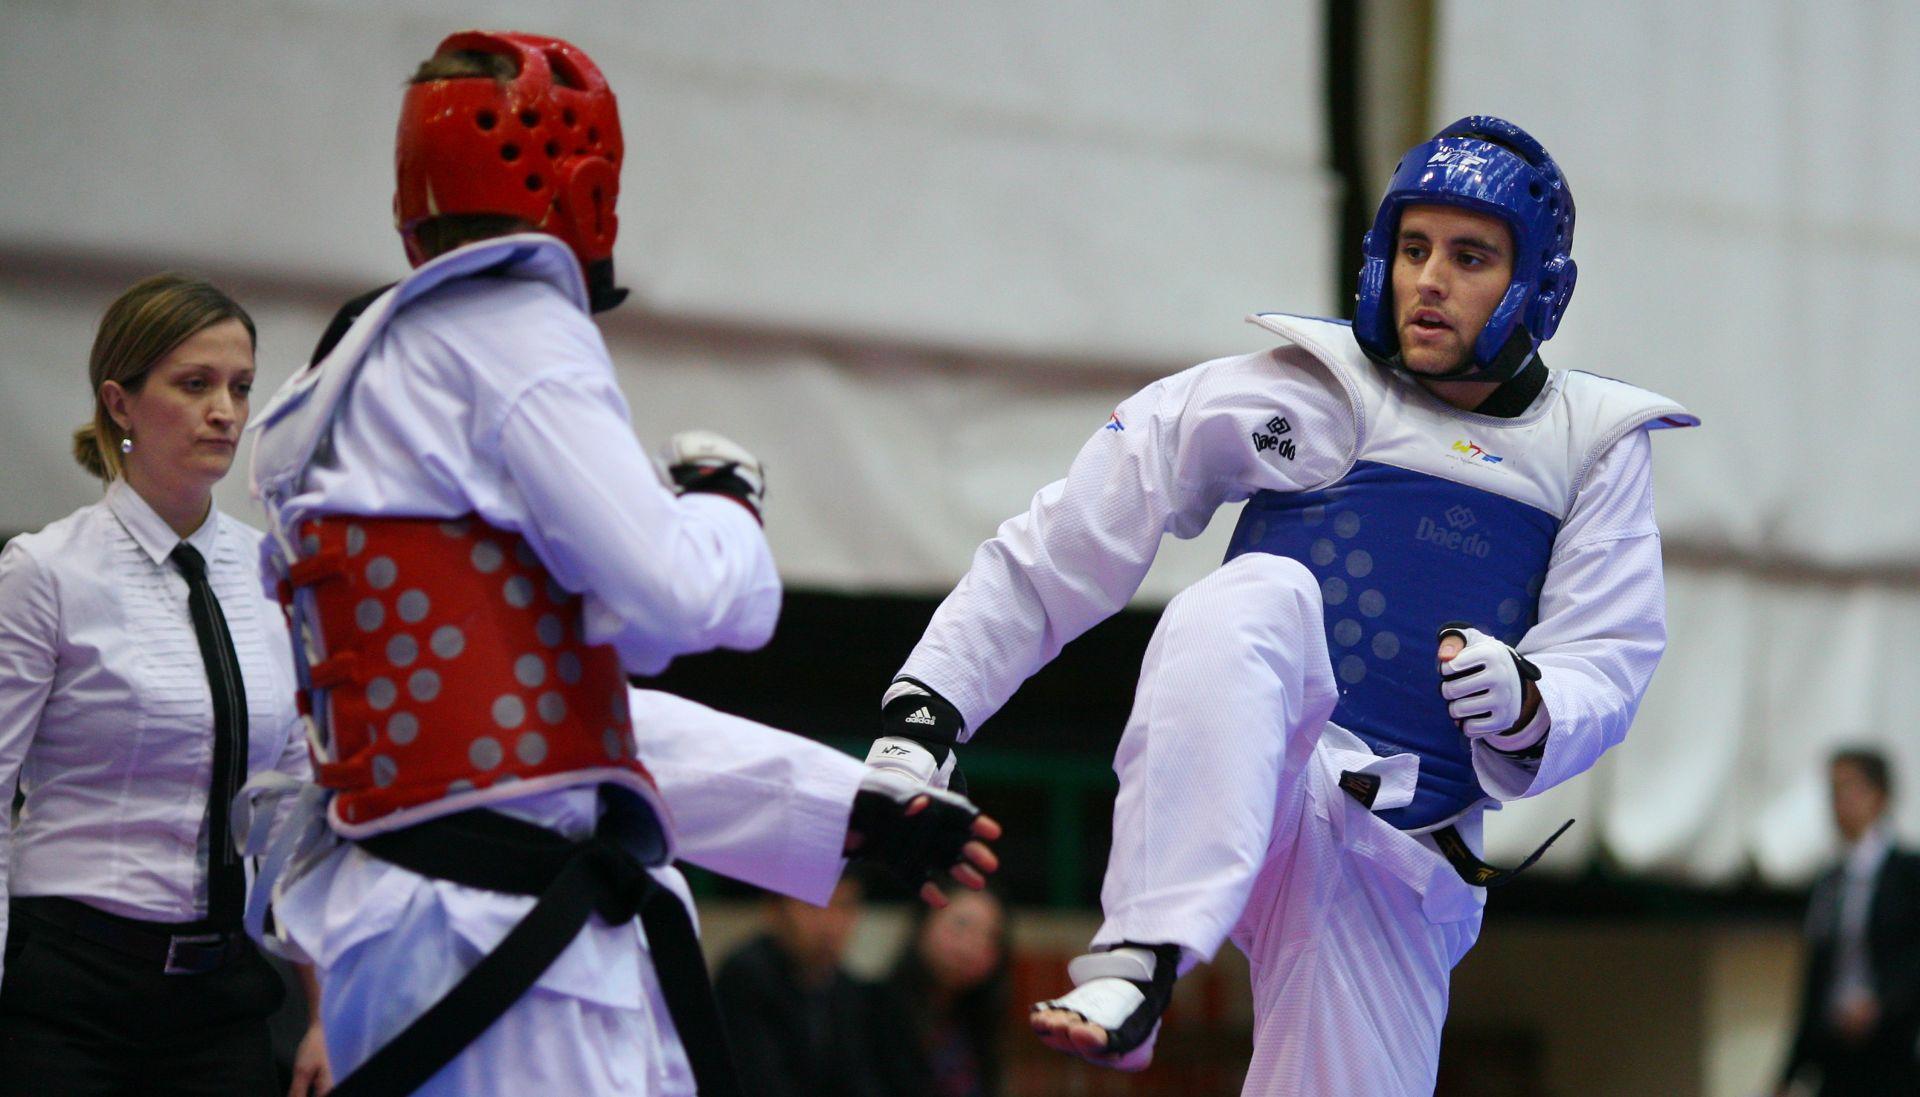 Taekwondo: Filip Grgić izborio nastup na Olimpijskim igrama